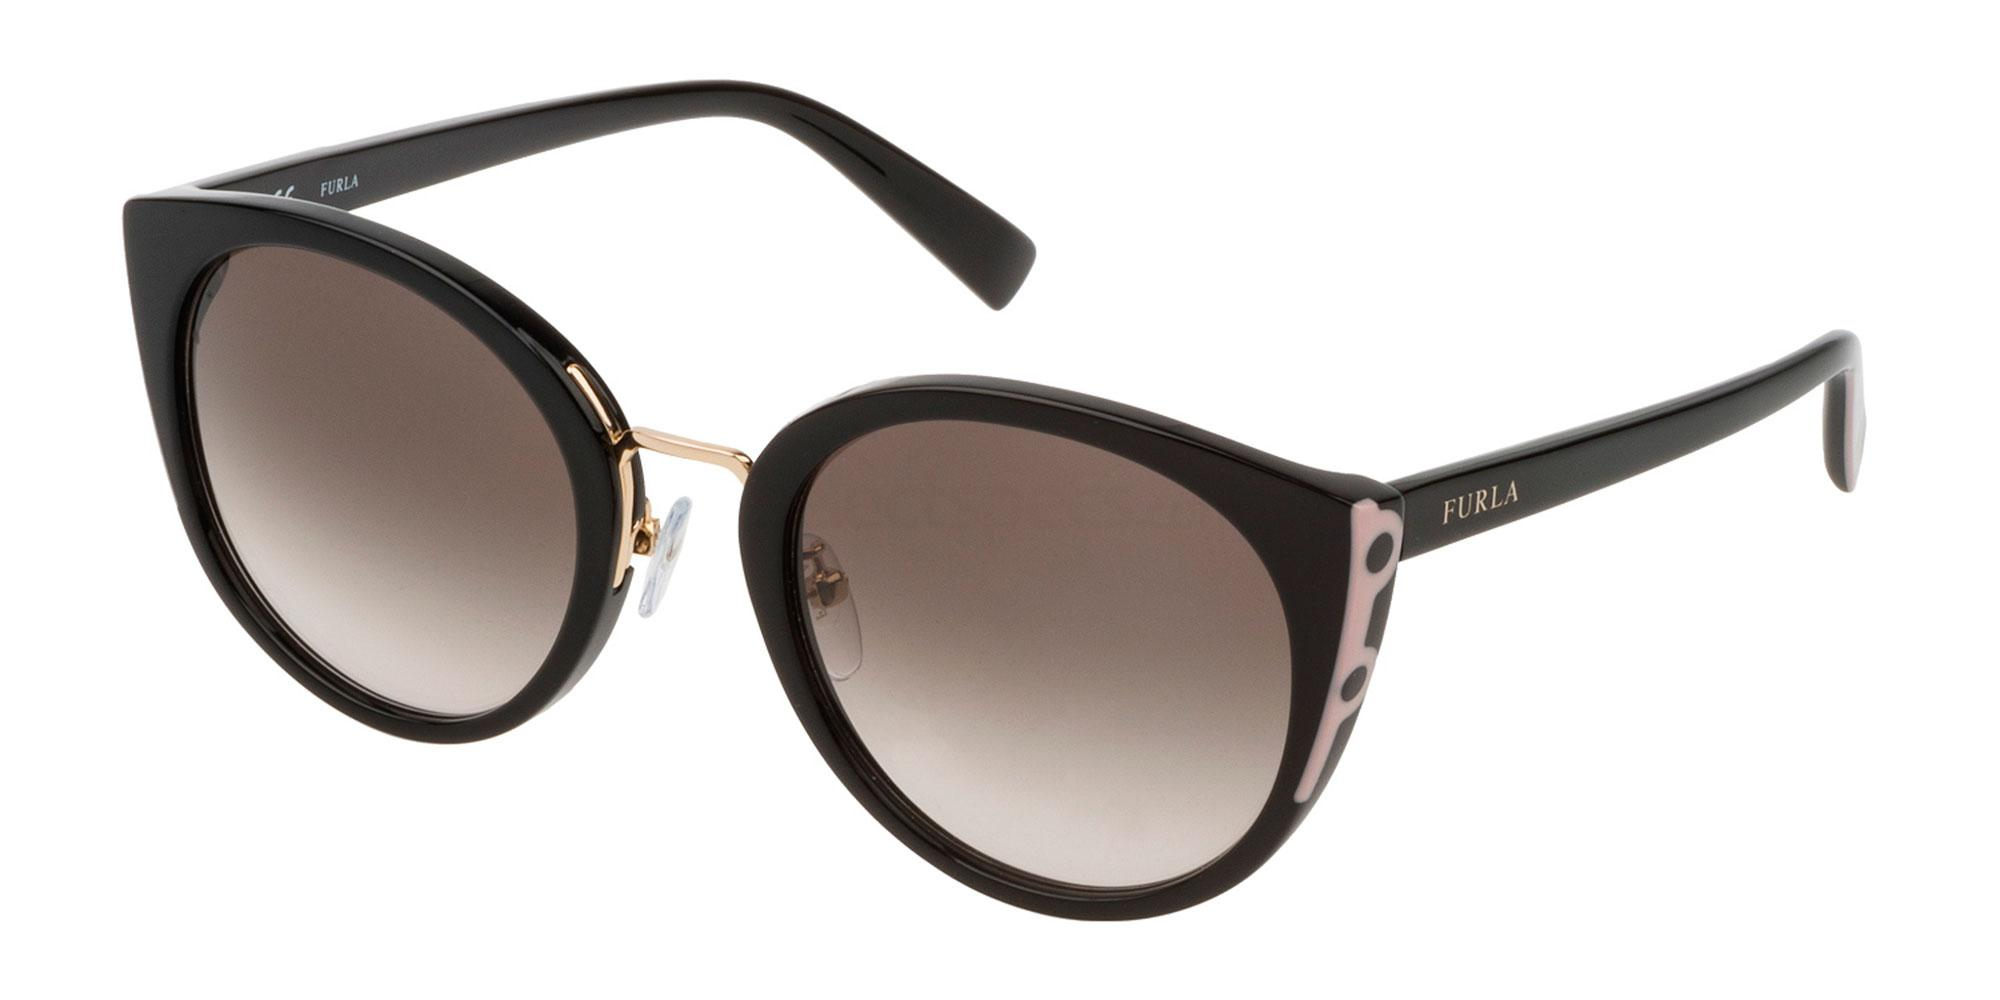 0700 SFU238 Sunglasses, Furla